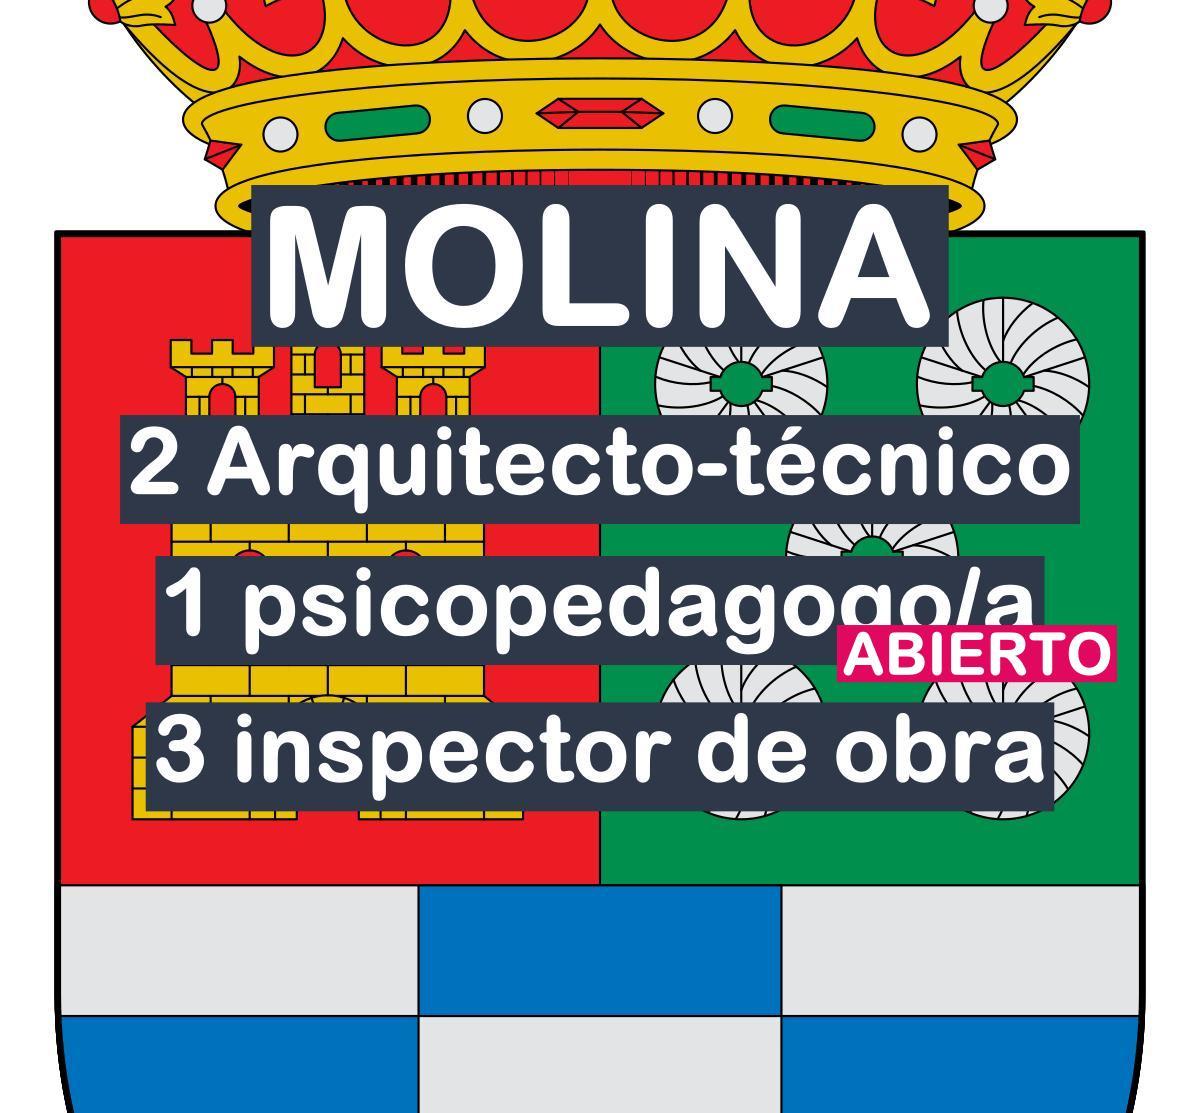 4 procesos de consolidación con lista de espera en Molina